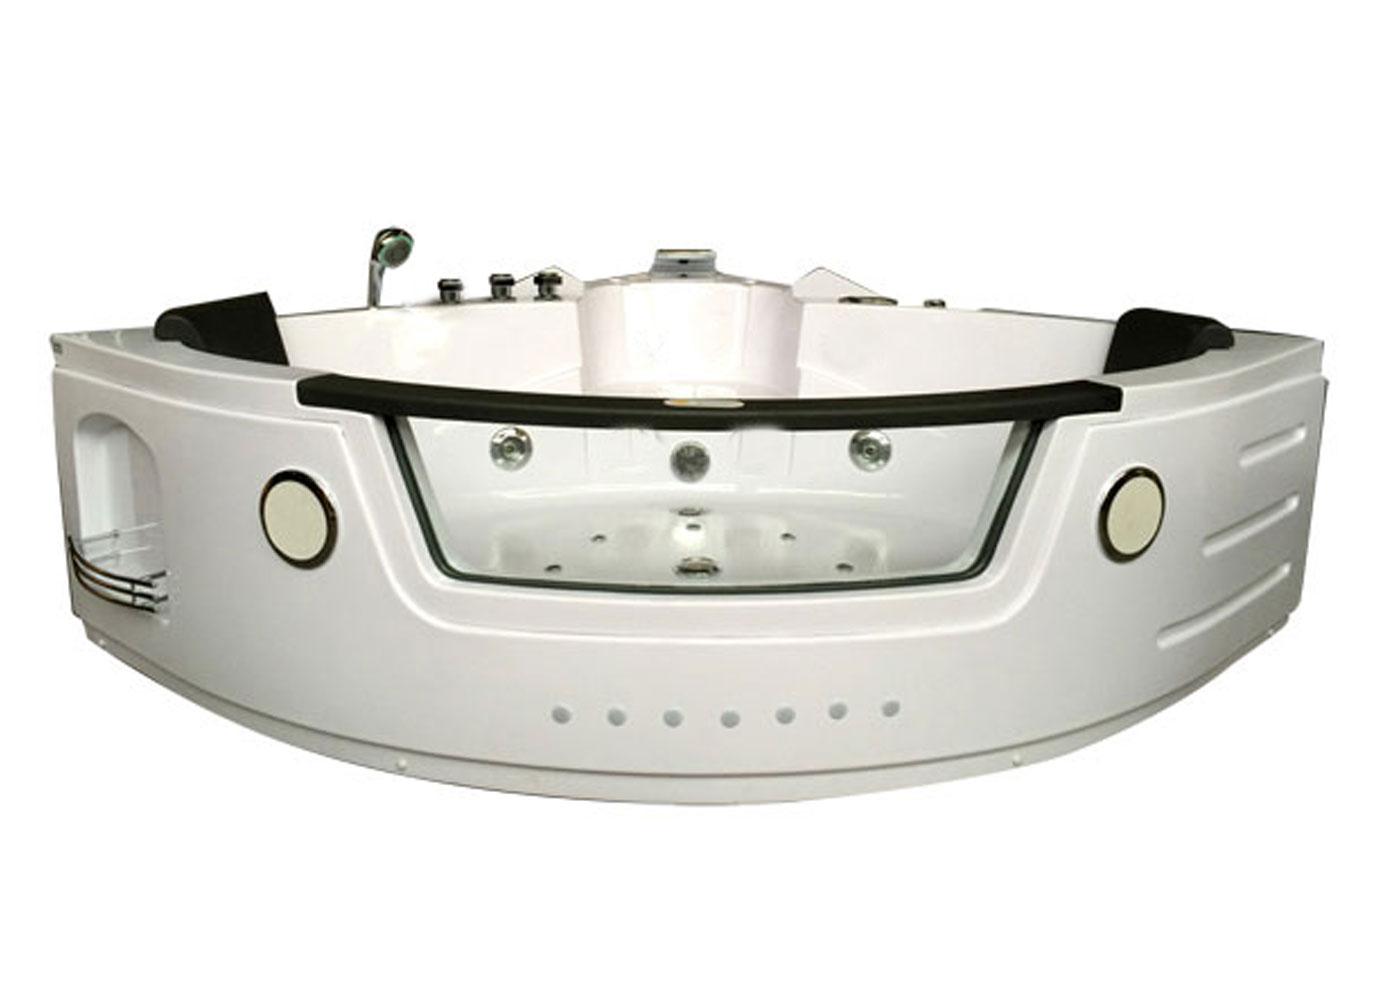 whirpool-bathtub-with-heater-Angelica1